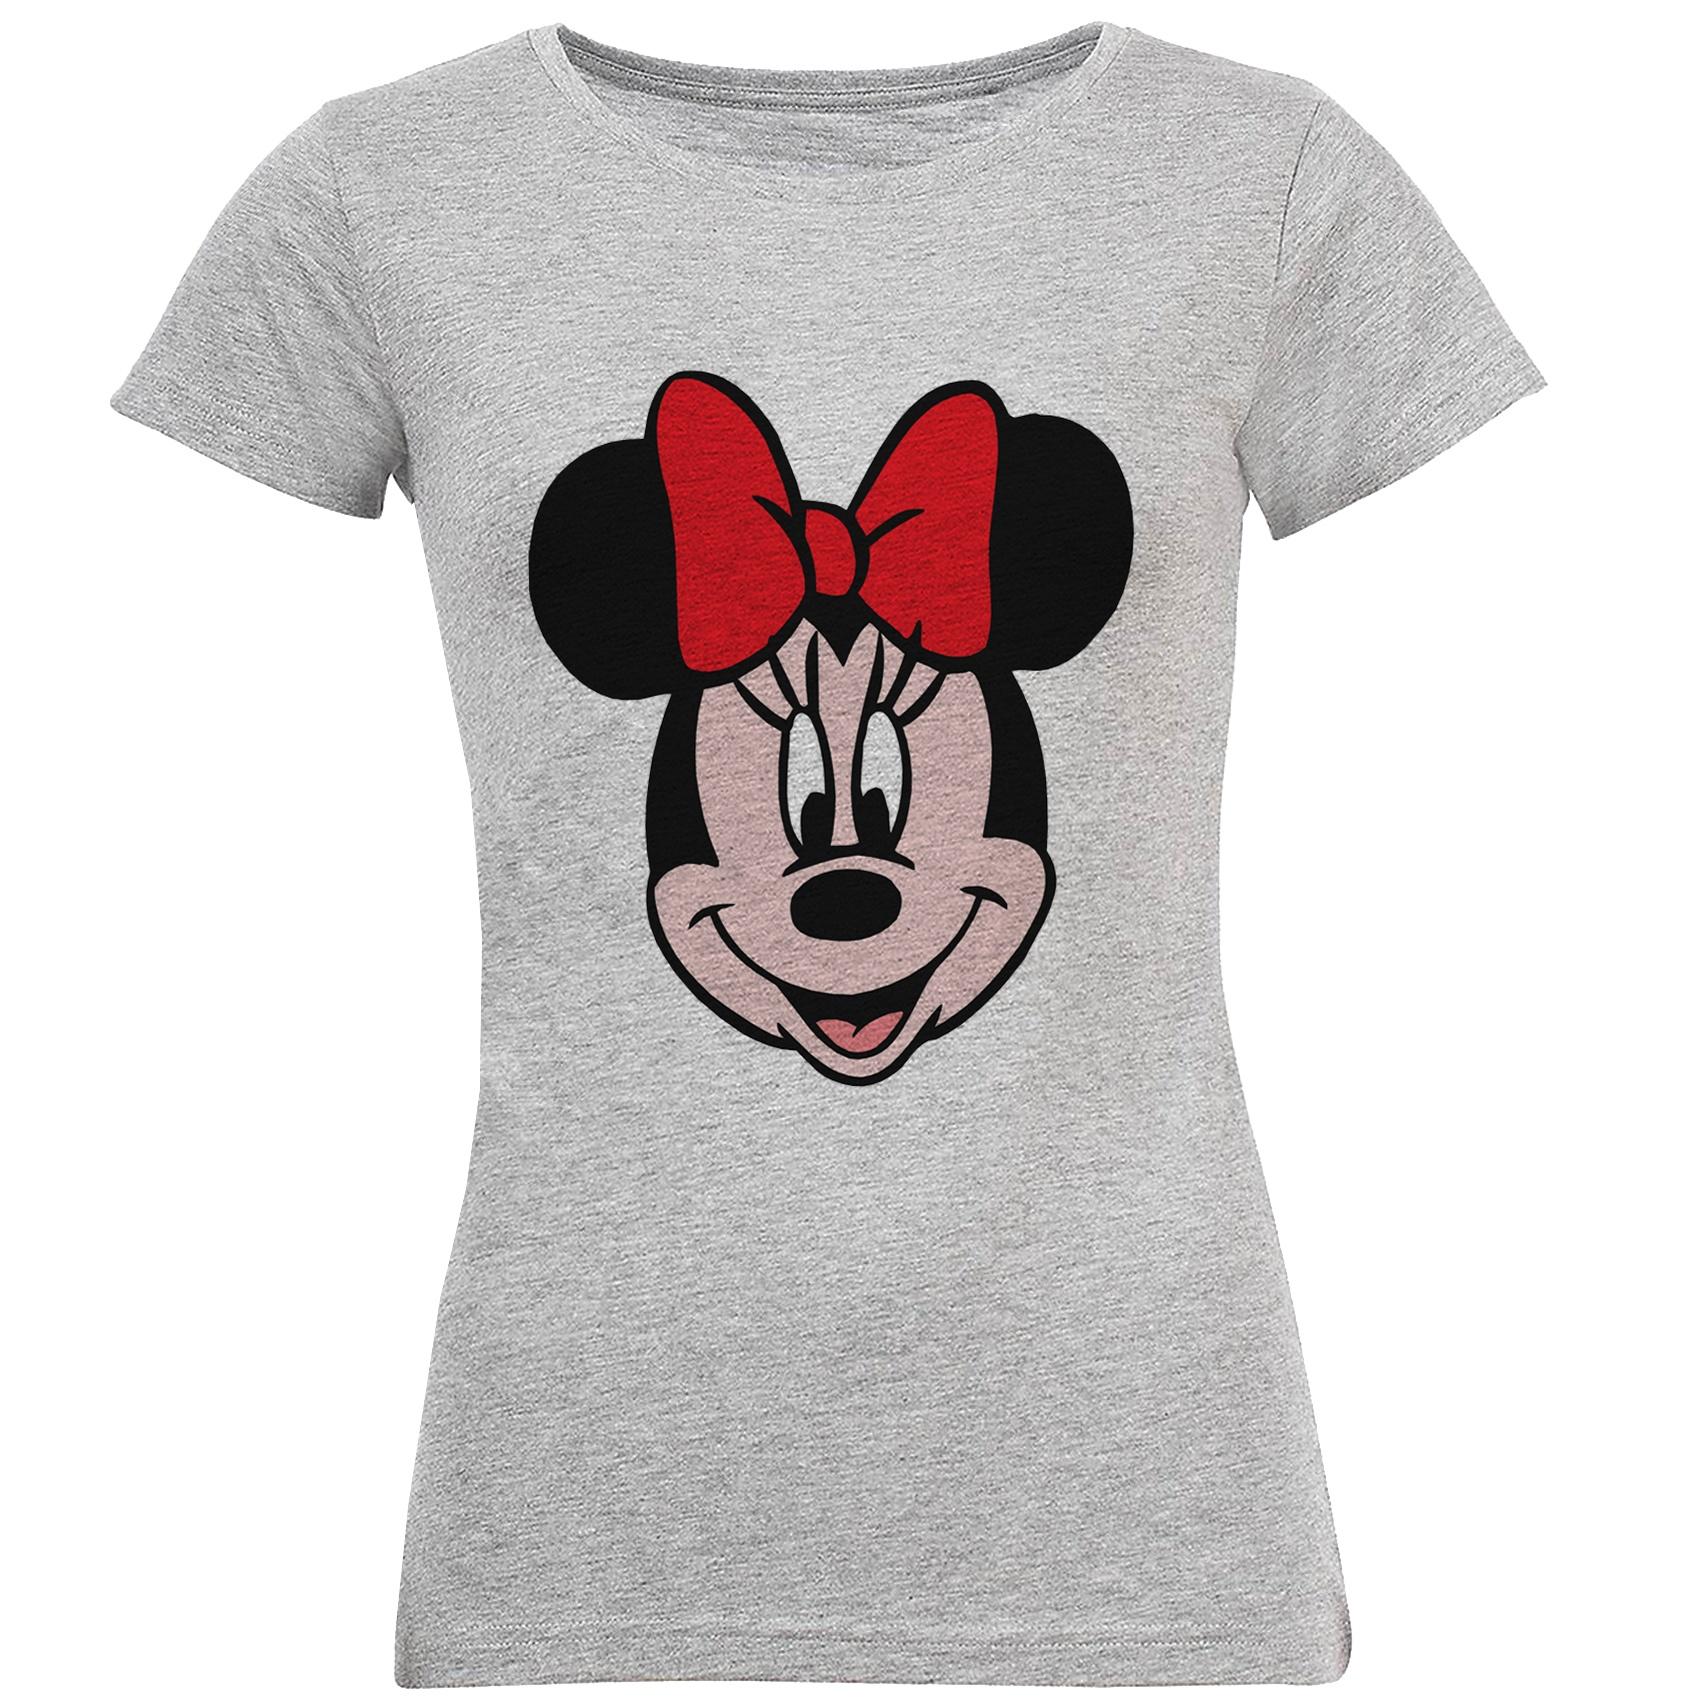 تی شرت زنانه طرح میکی موس کد S43